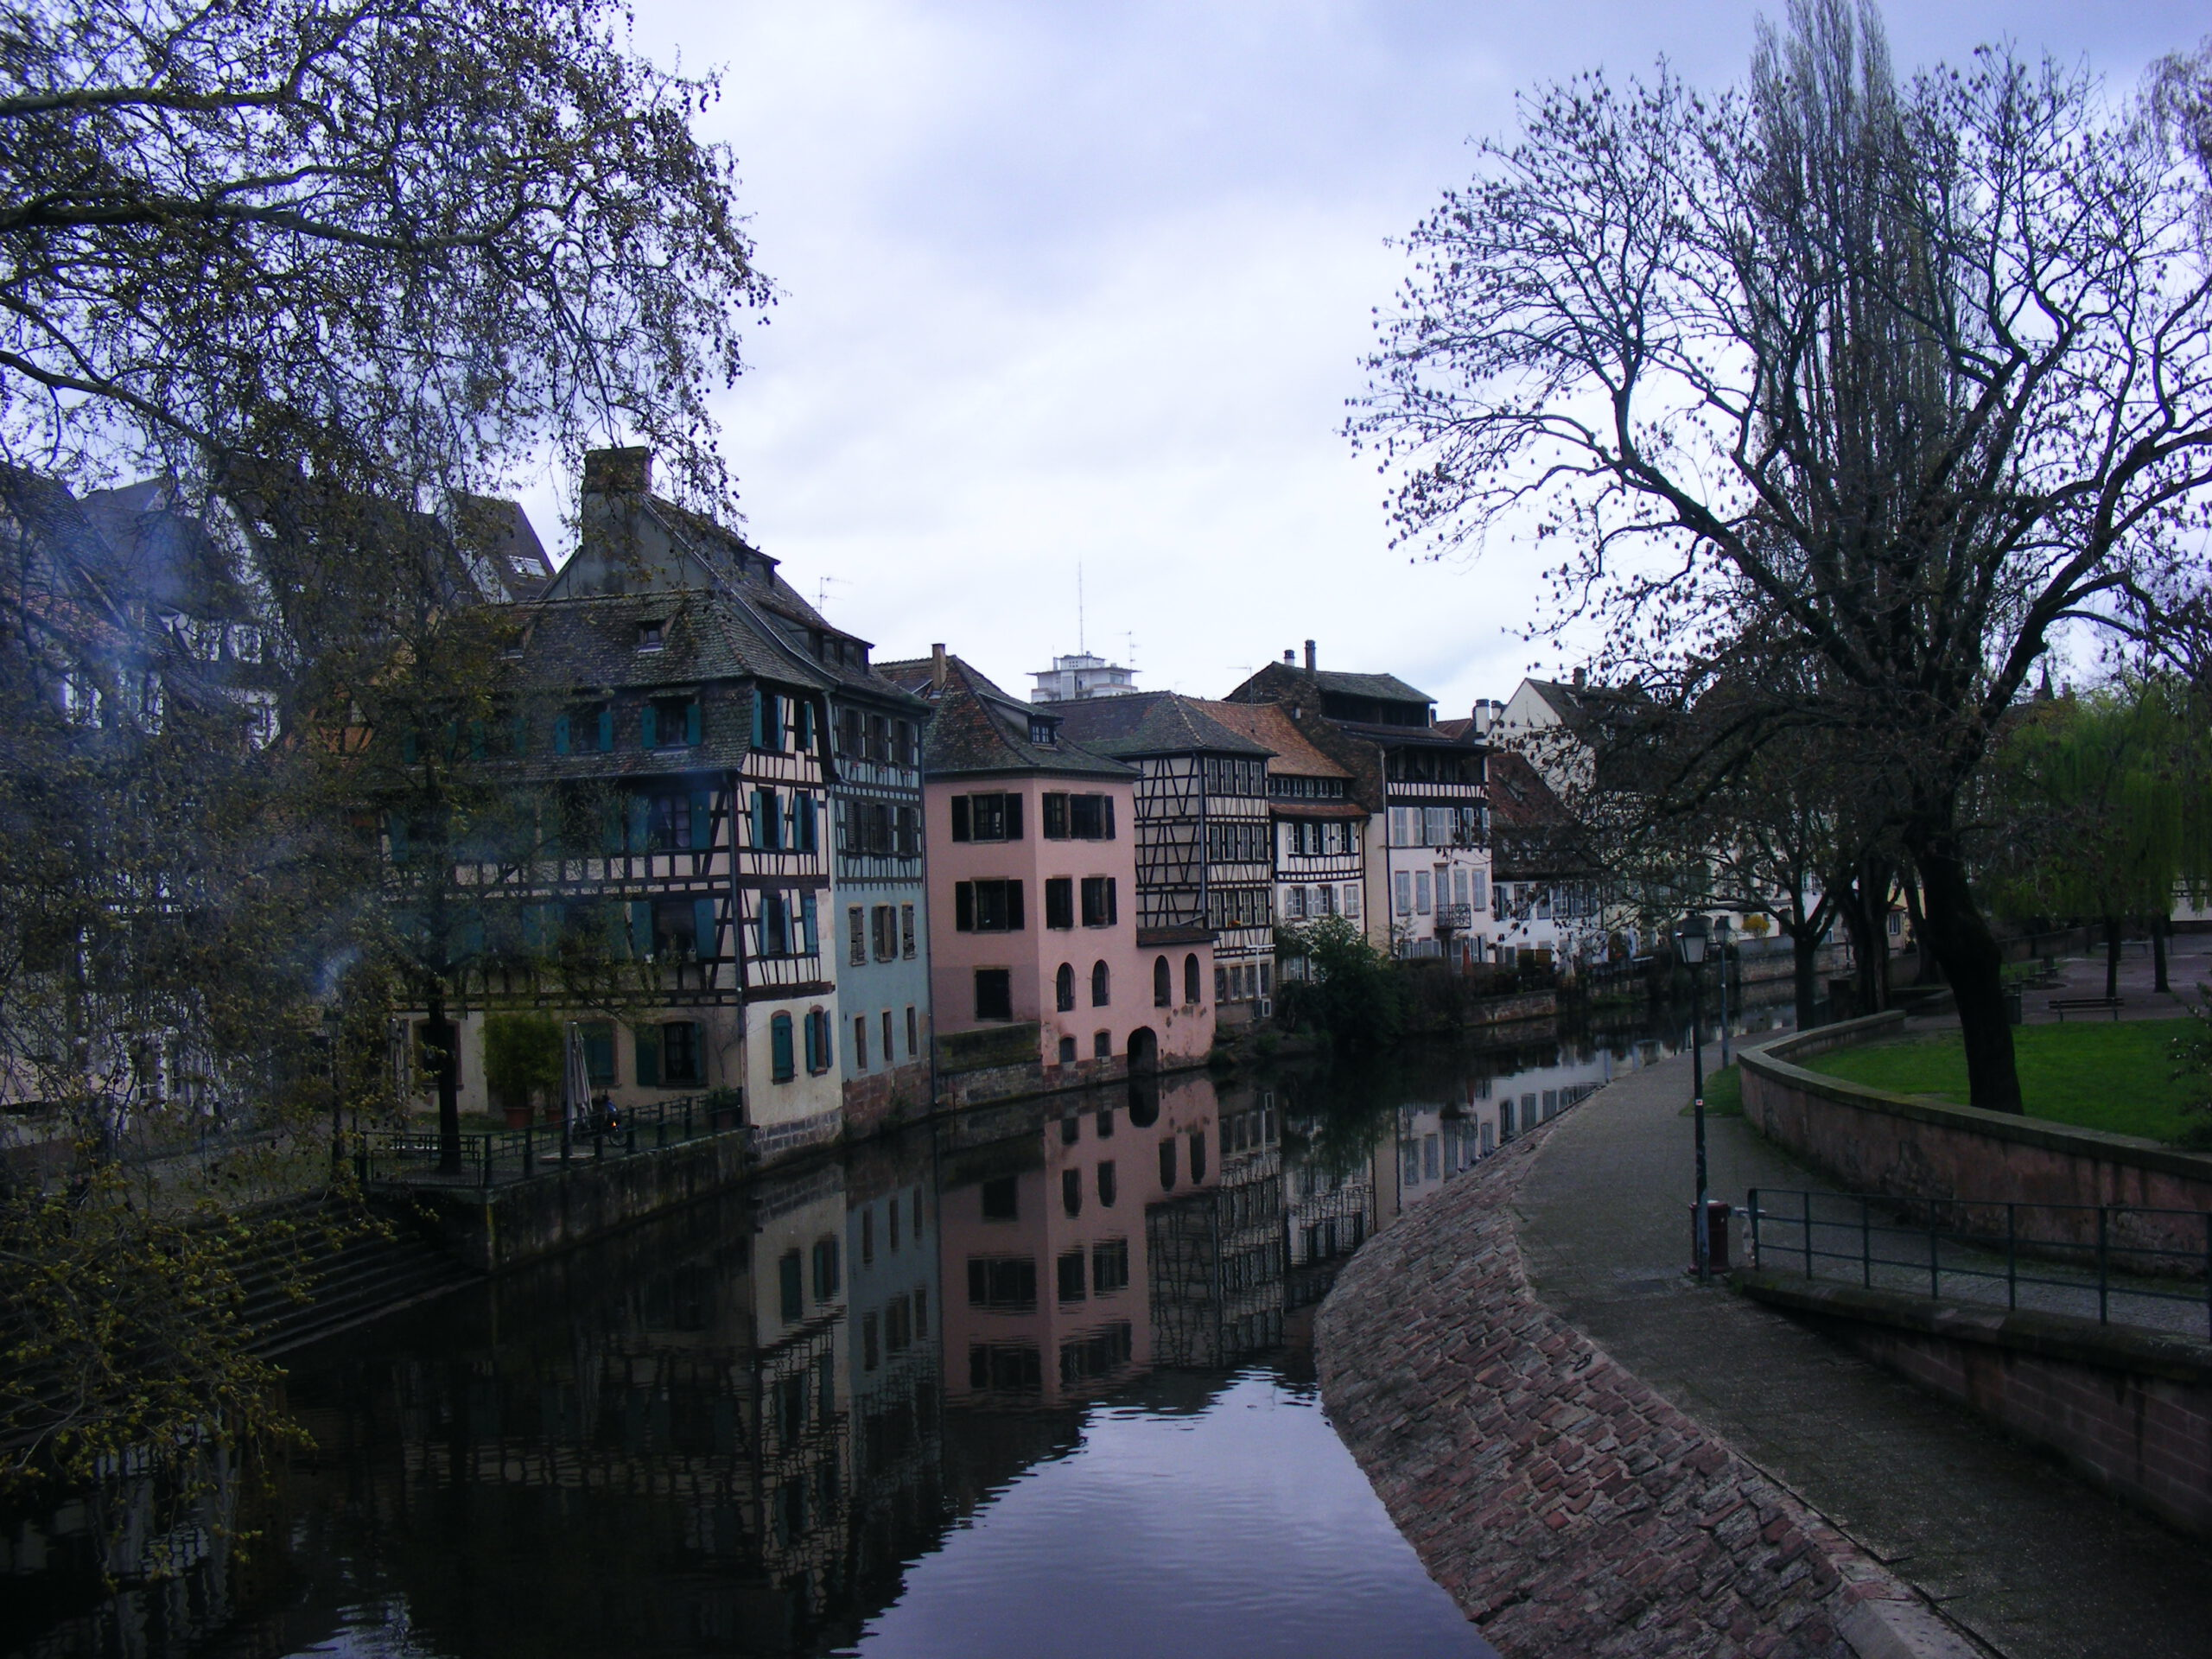 054_Strasbourg_2016